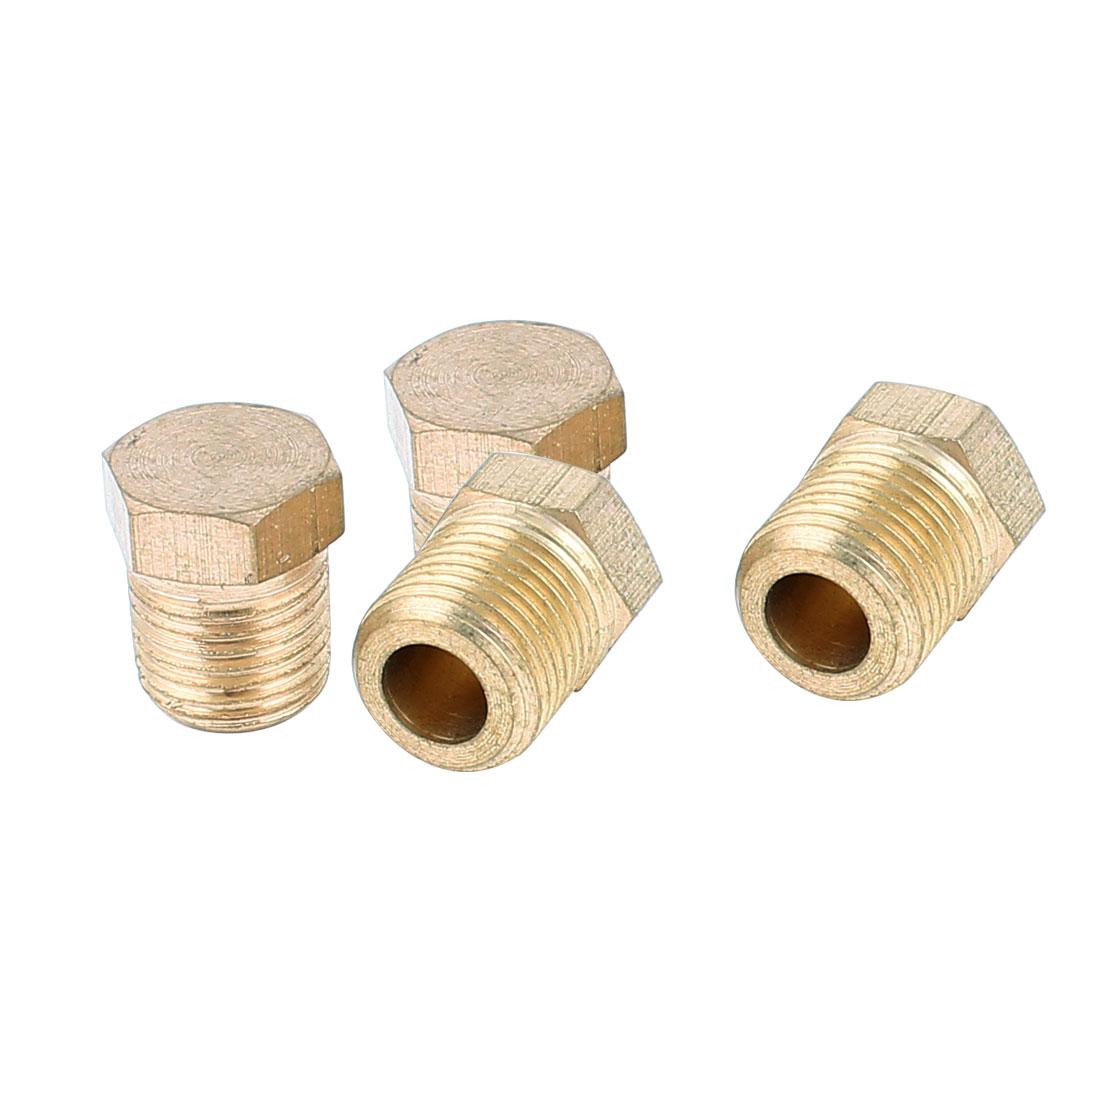 1/8BSP Male Thread Dia Brass Internal Hex Head Pipe Connector Gold Tone 4pcs